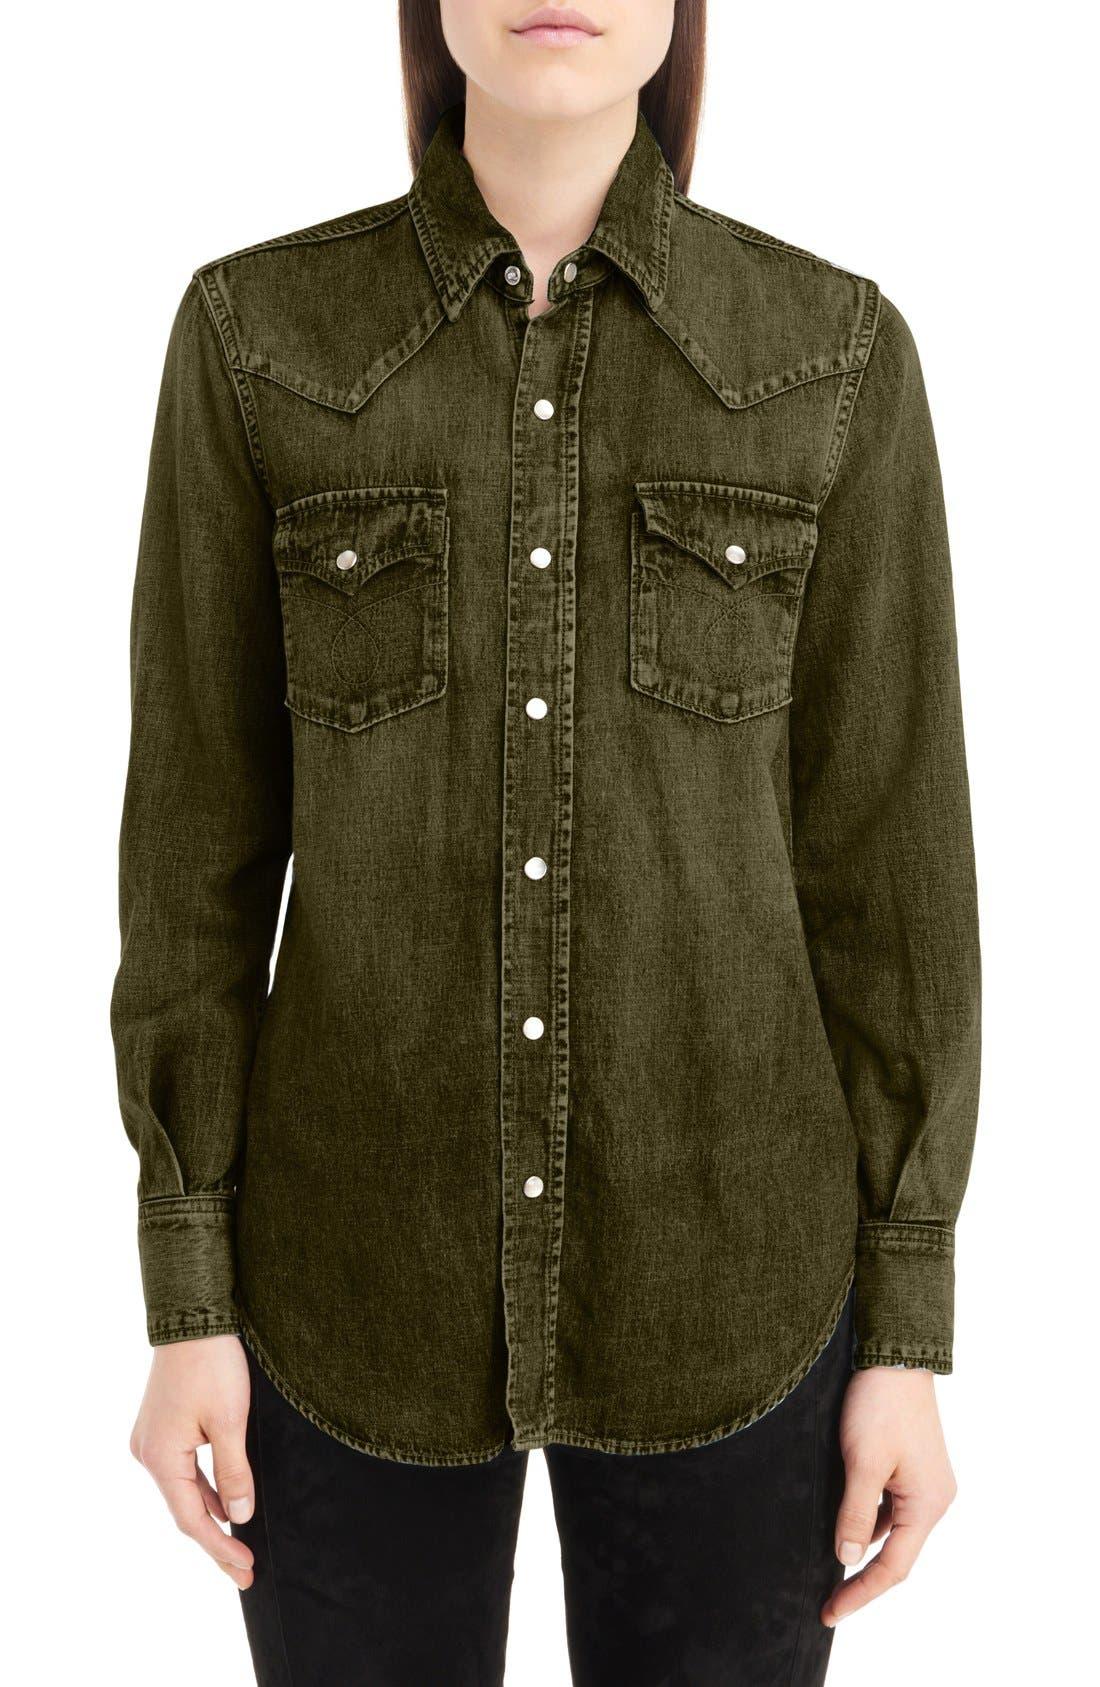 Western Stitched Pocket Shirt,                             Main thumbnail 1, color,                             Army Green